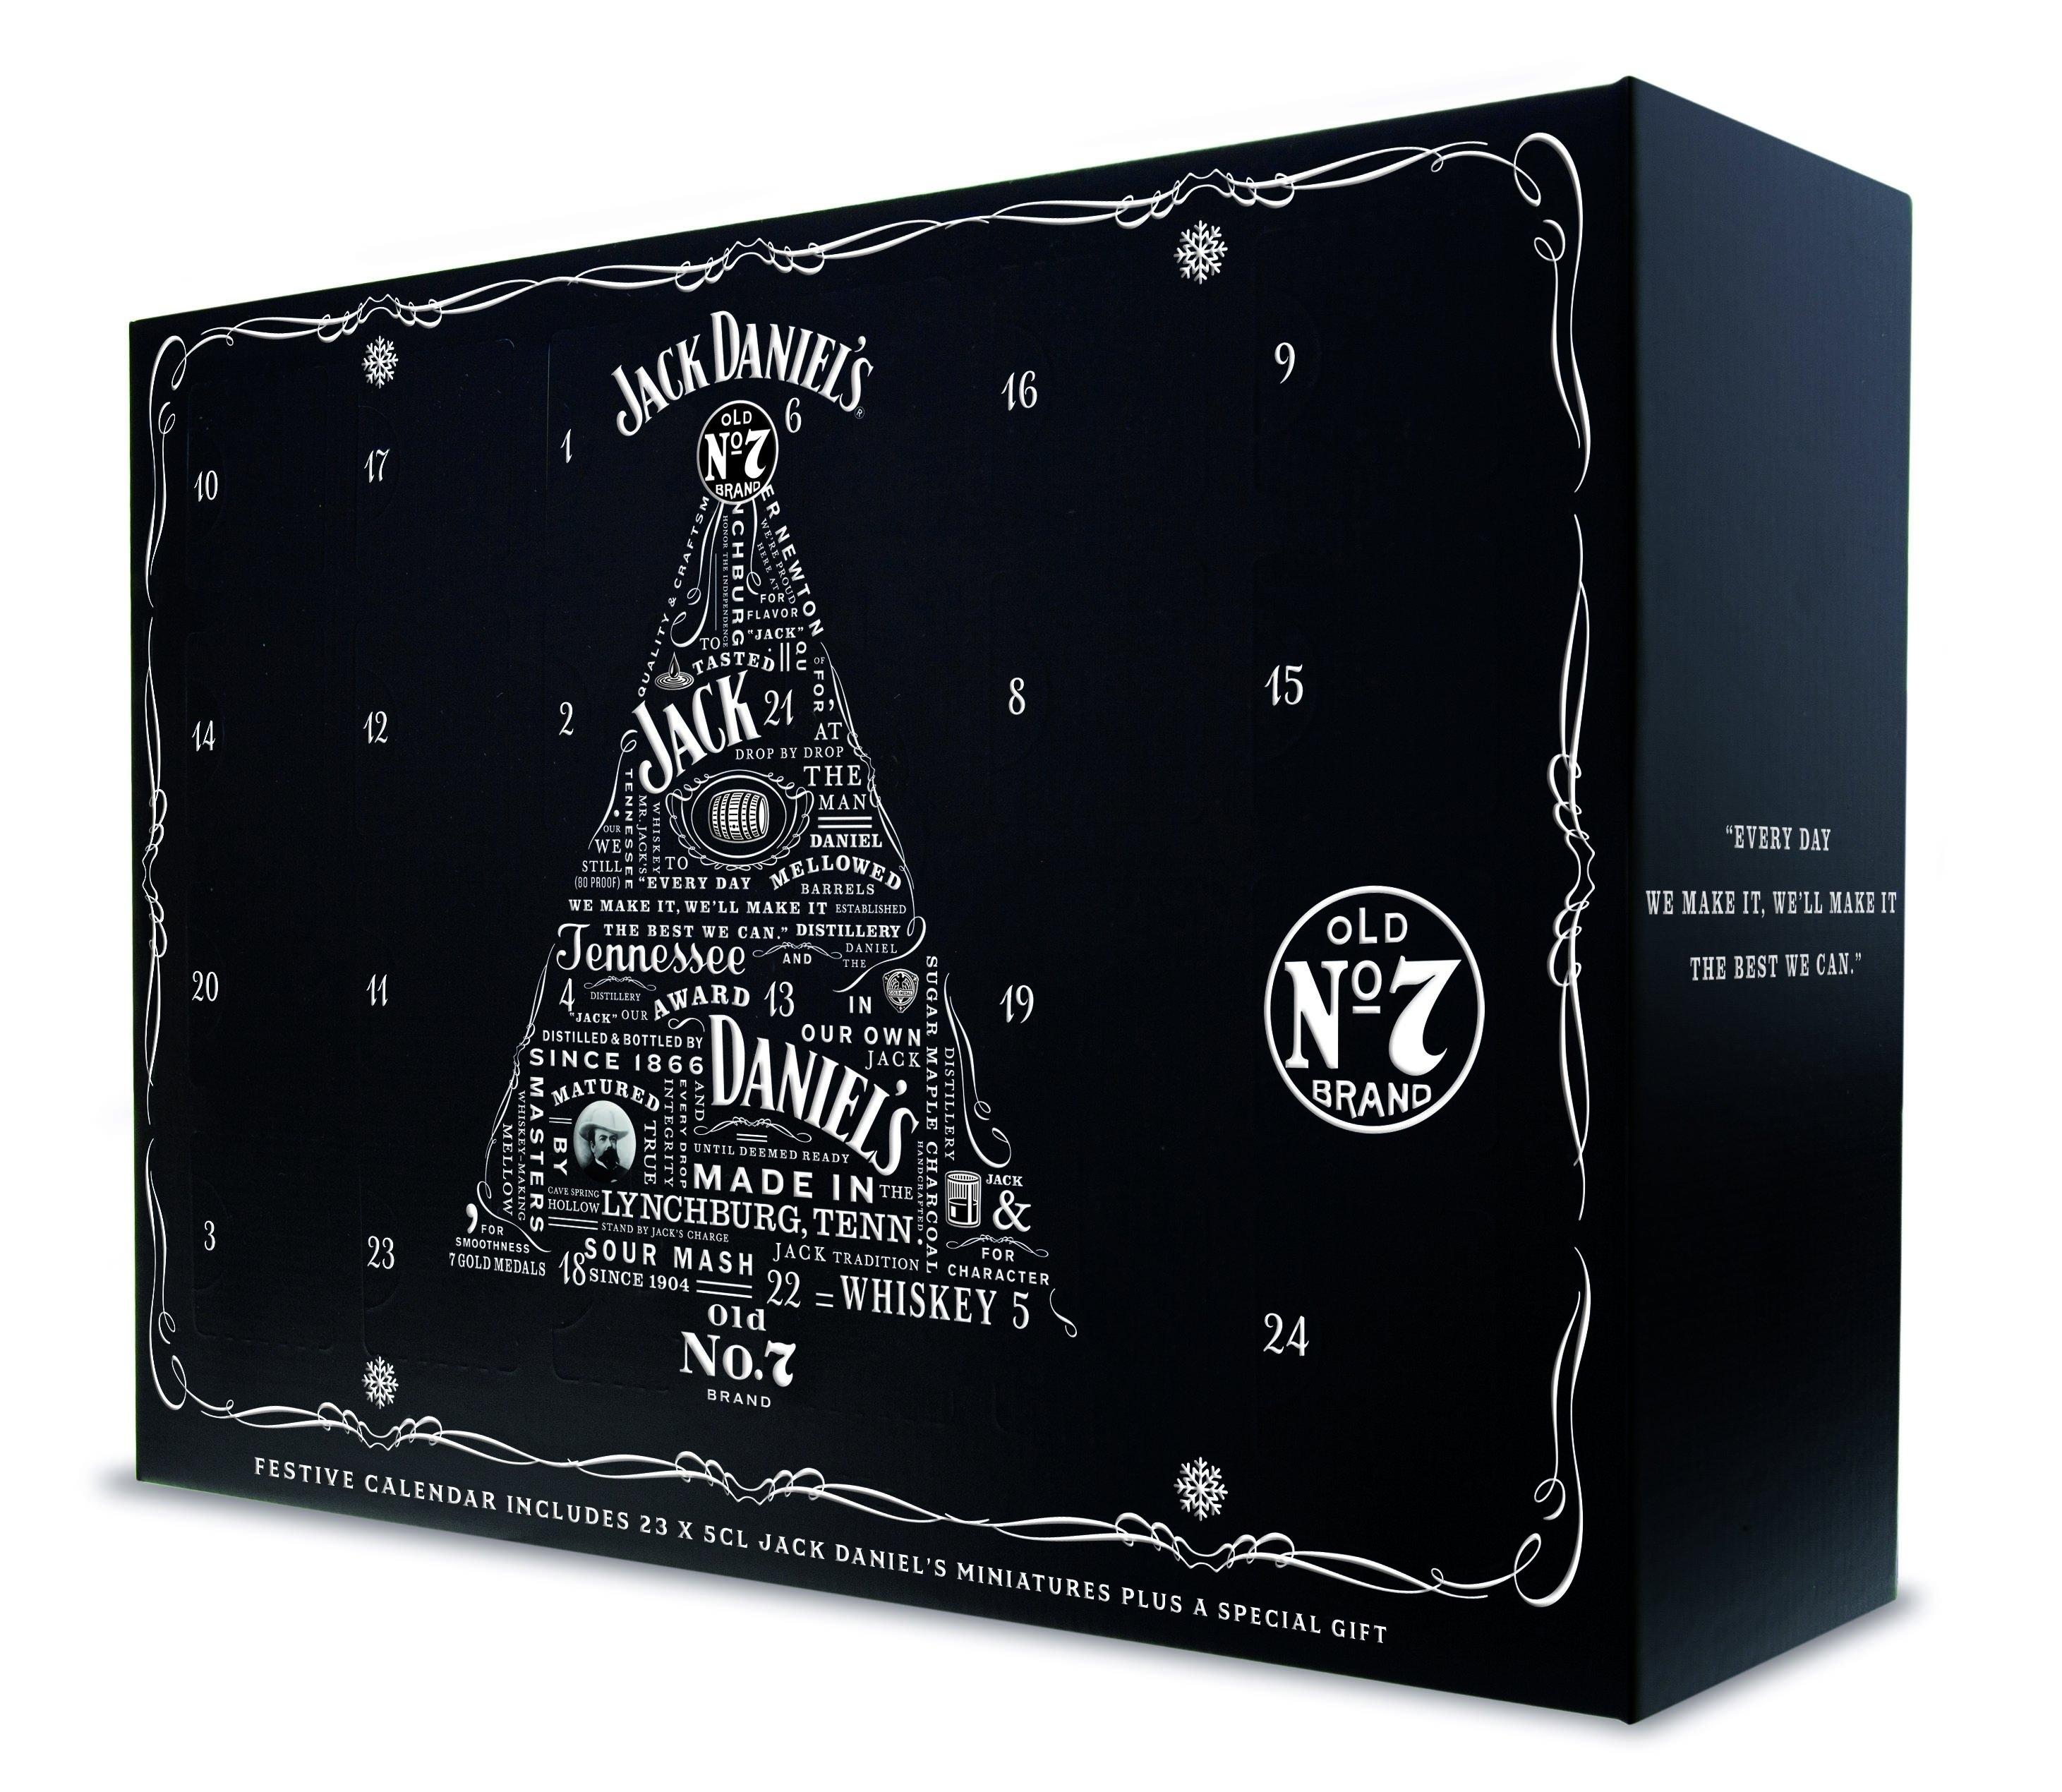 Jack Daniel's Festive Whiskey Calendar   The Jack Store No 7 Advent Calendar 2019